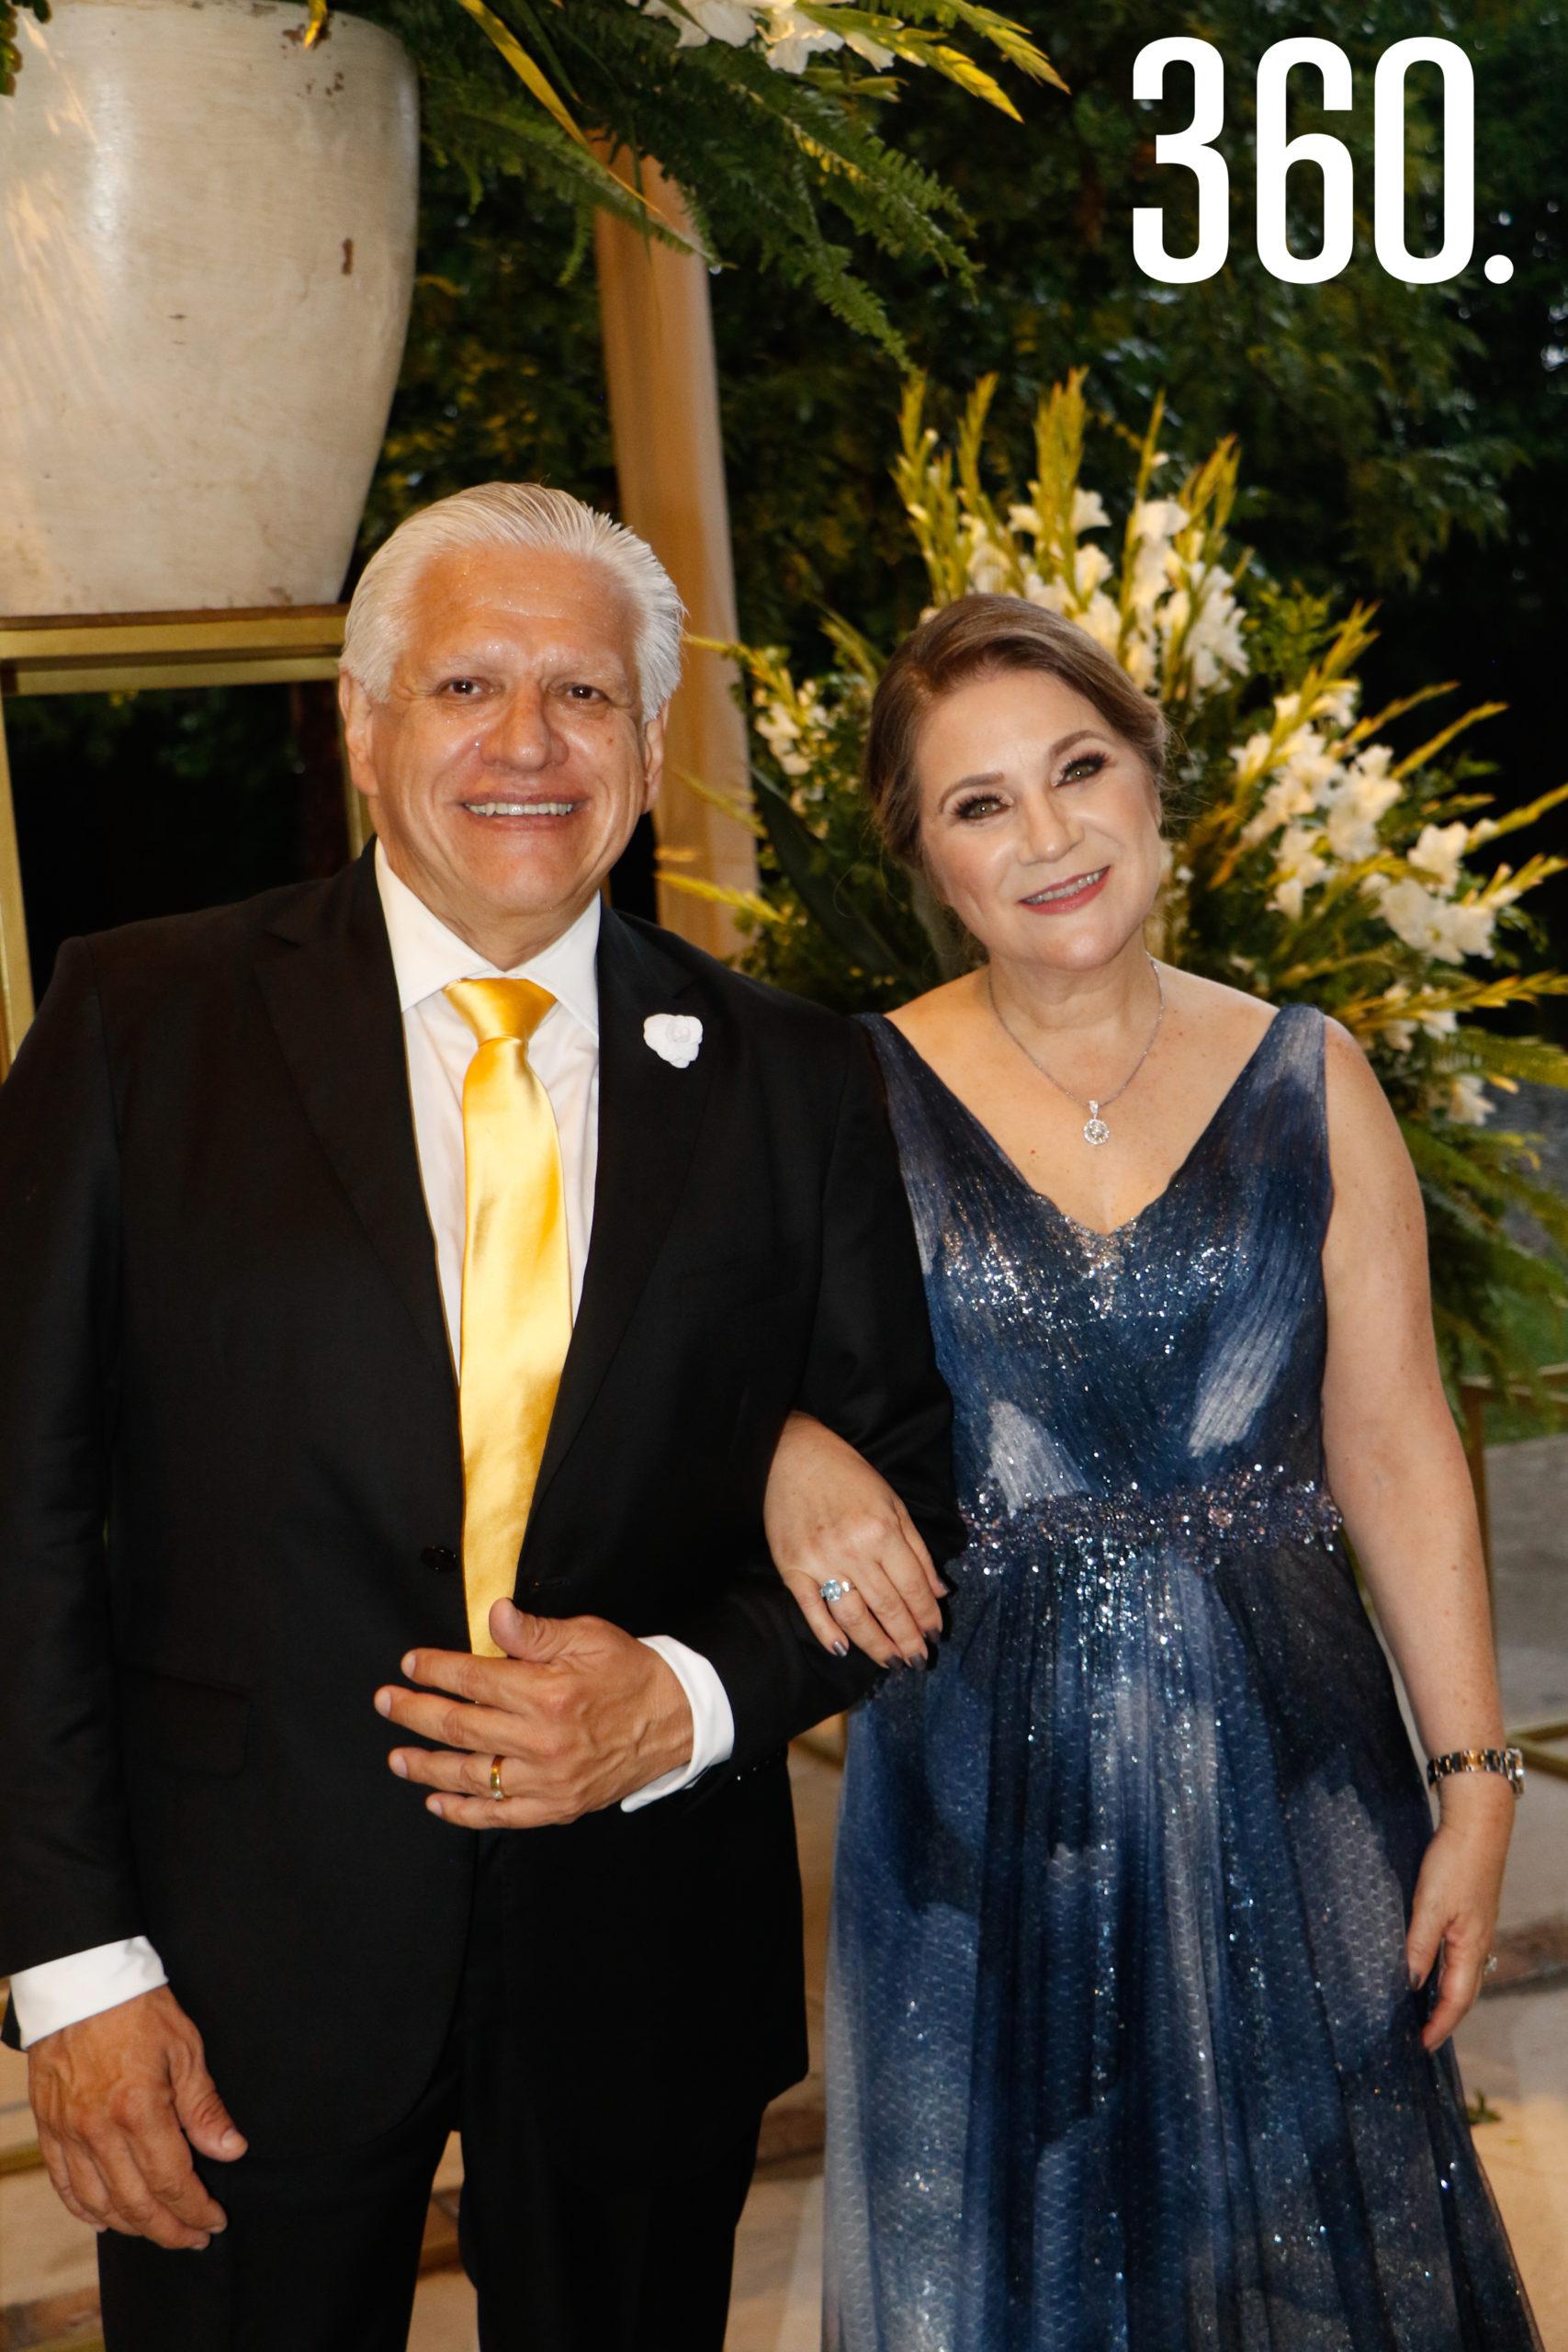 Enrique Castillo e Hilda Richer de Castillo, padres de la novia.